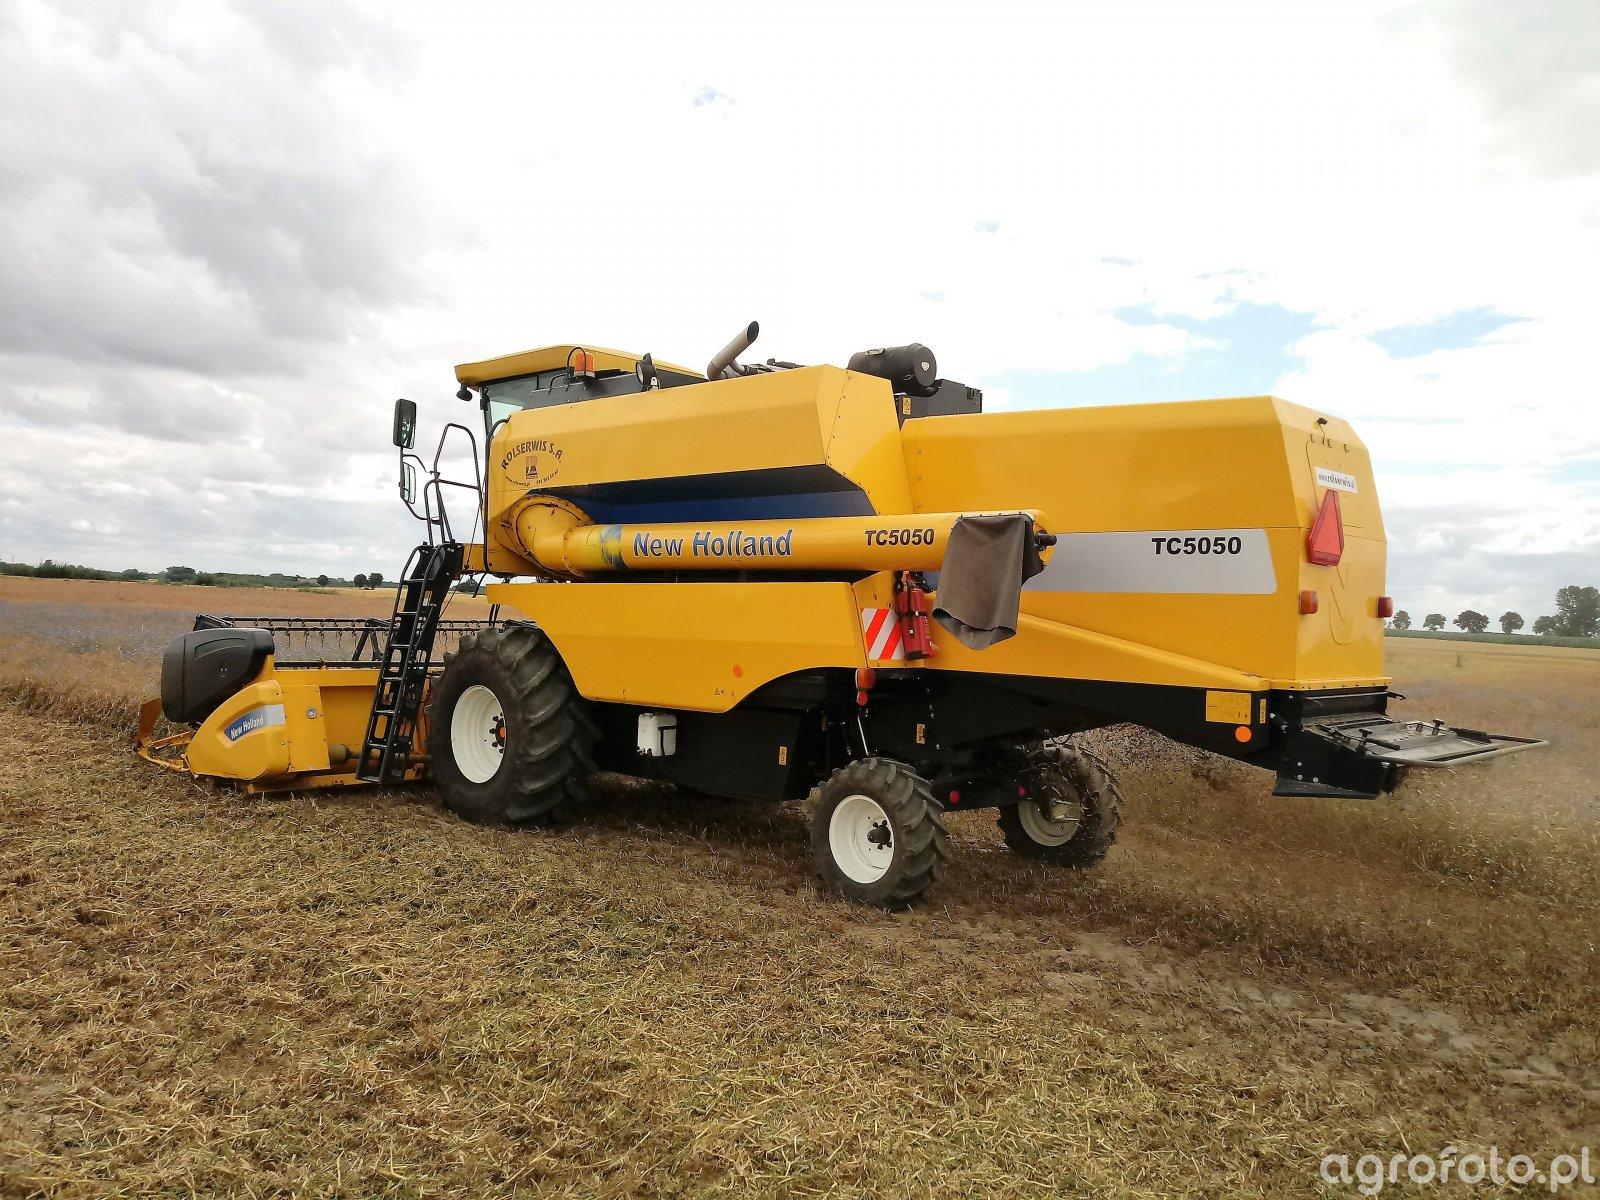 New Holland TC5050